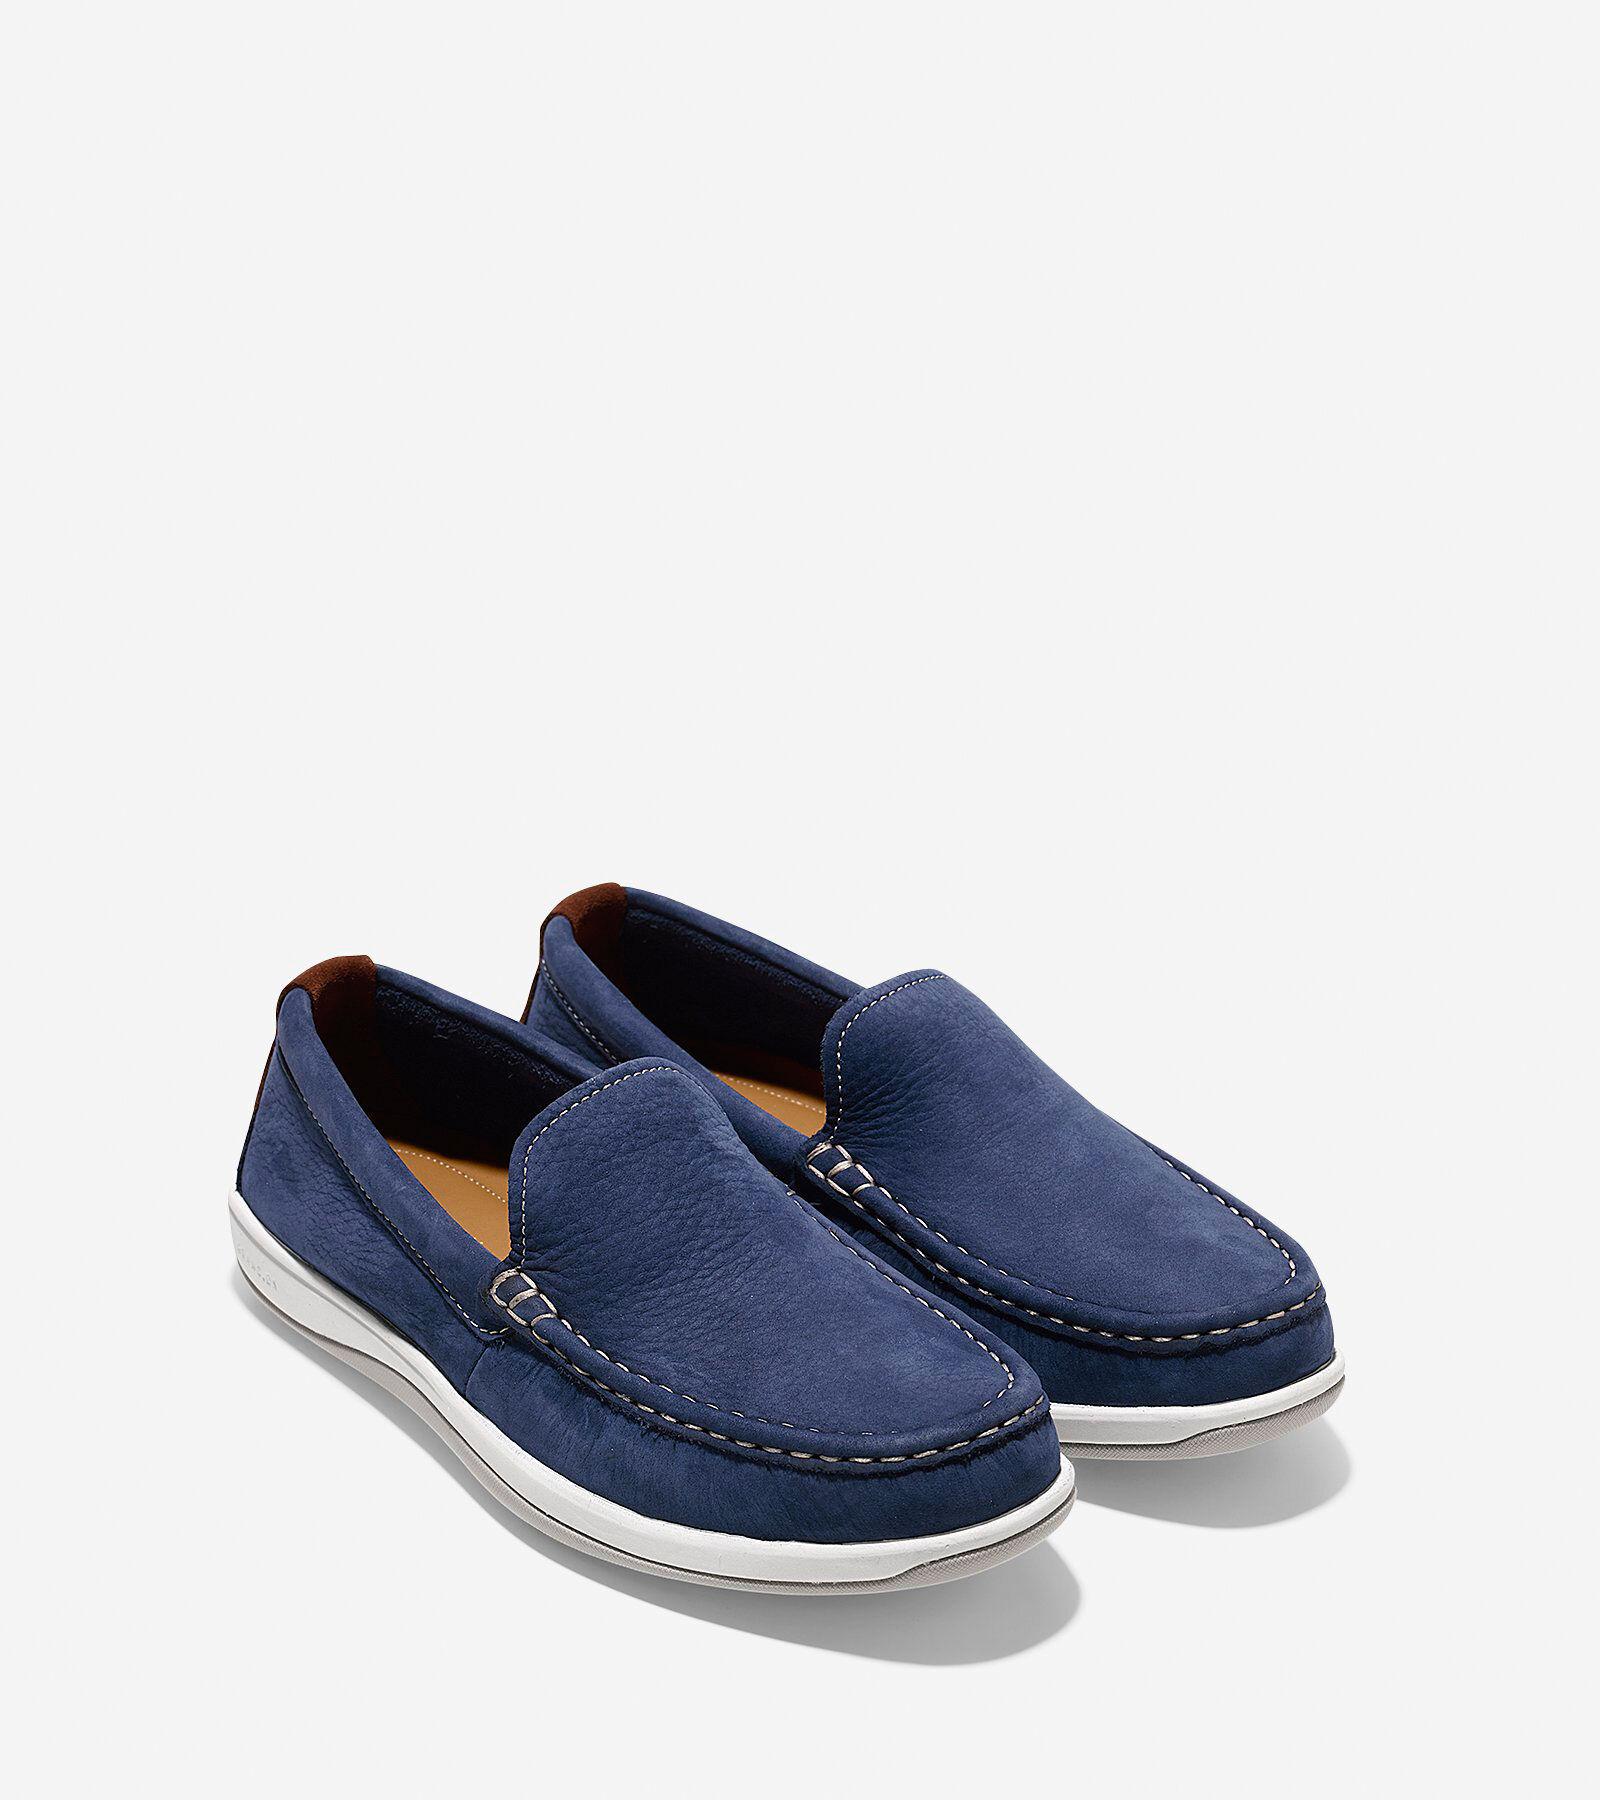 Cole Haan Boothbay Slip-On Loafer Marine Blue Nubuck Men